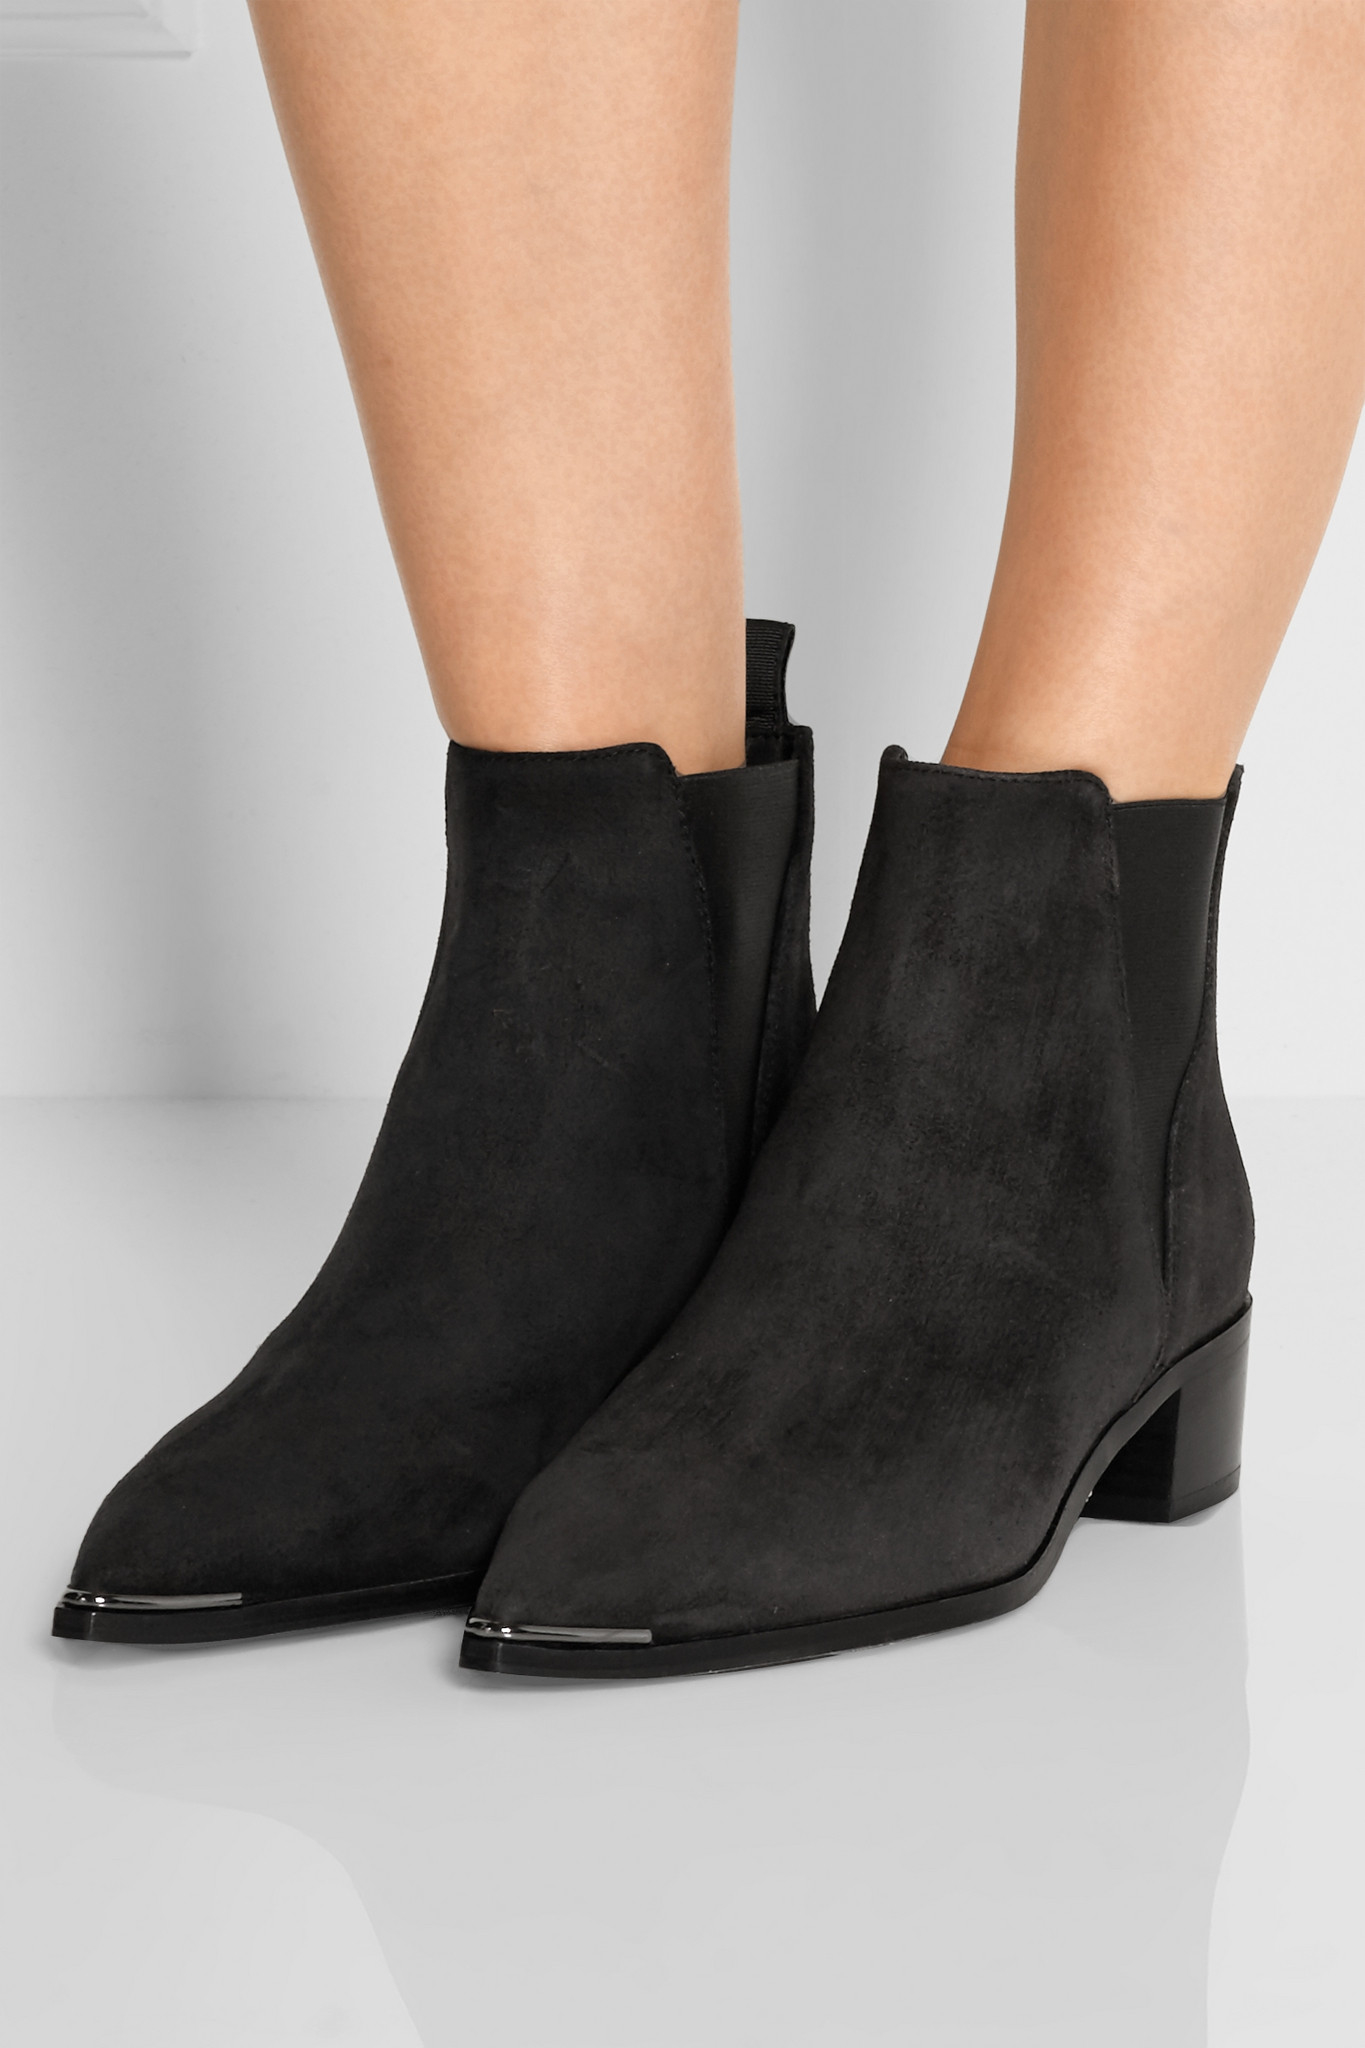 acne jensen suede ankle boots in black lyst. Black Bedroom Furniture Sets. Home Design Ideas